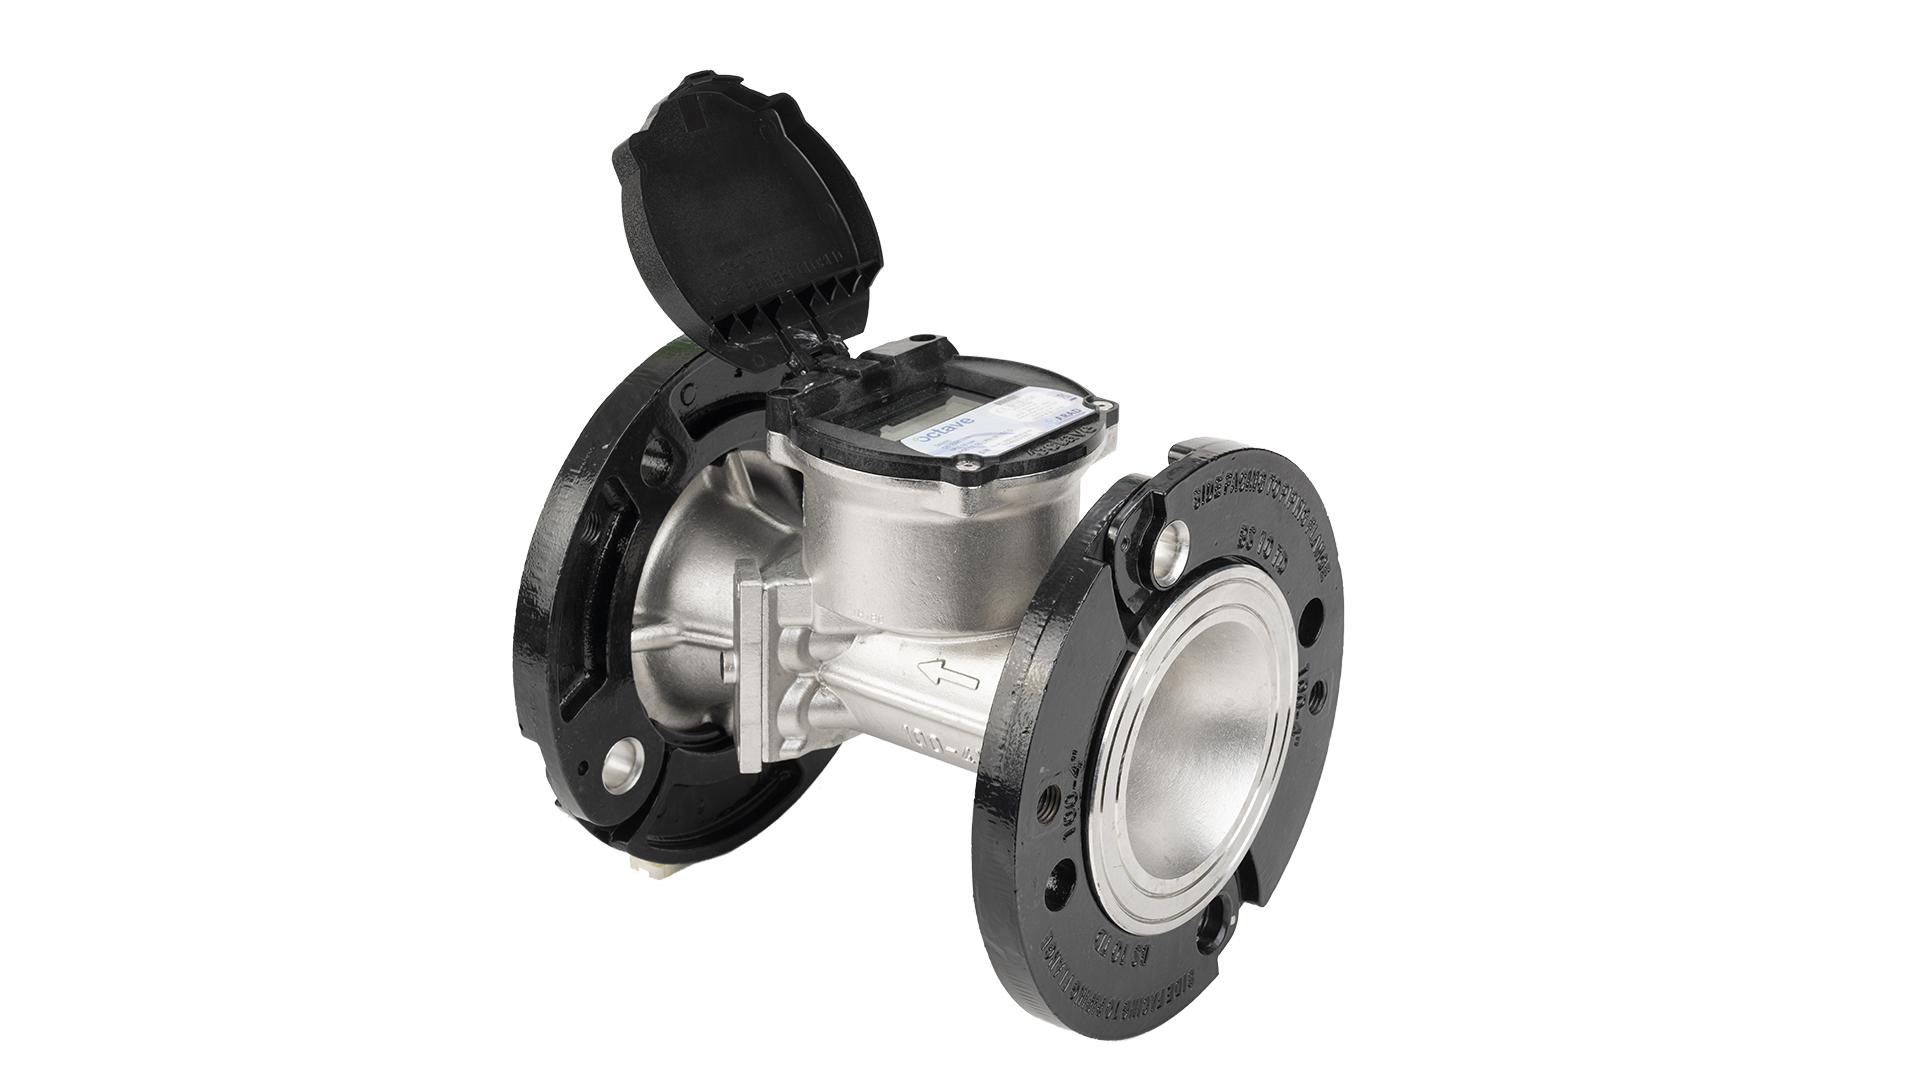 Gallery image 2 - Octave - Bulk ultrasonic water meter